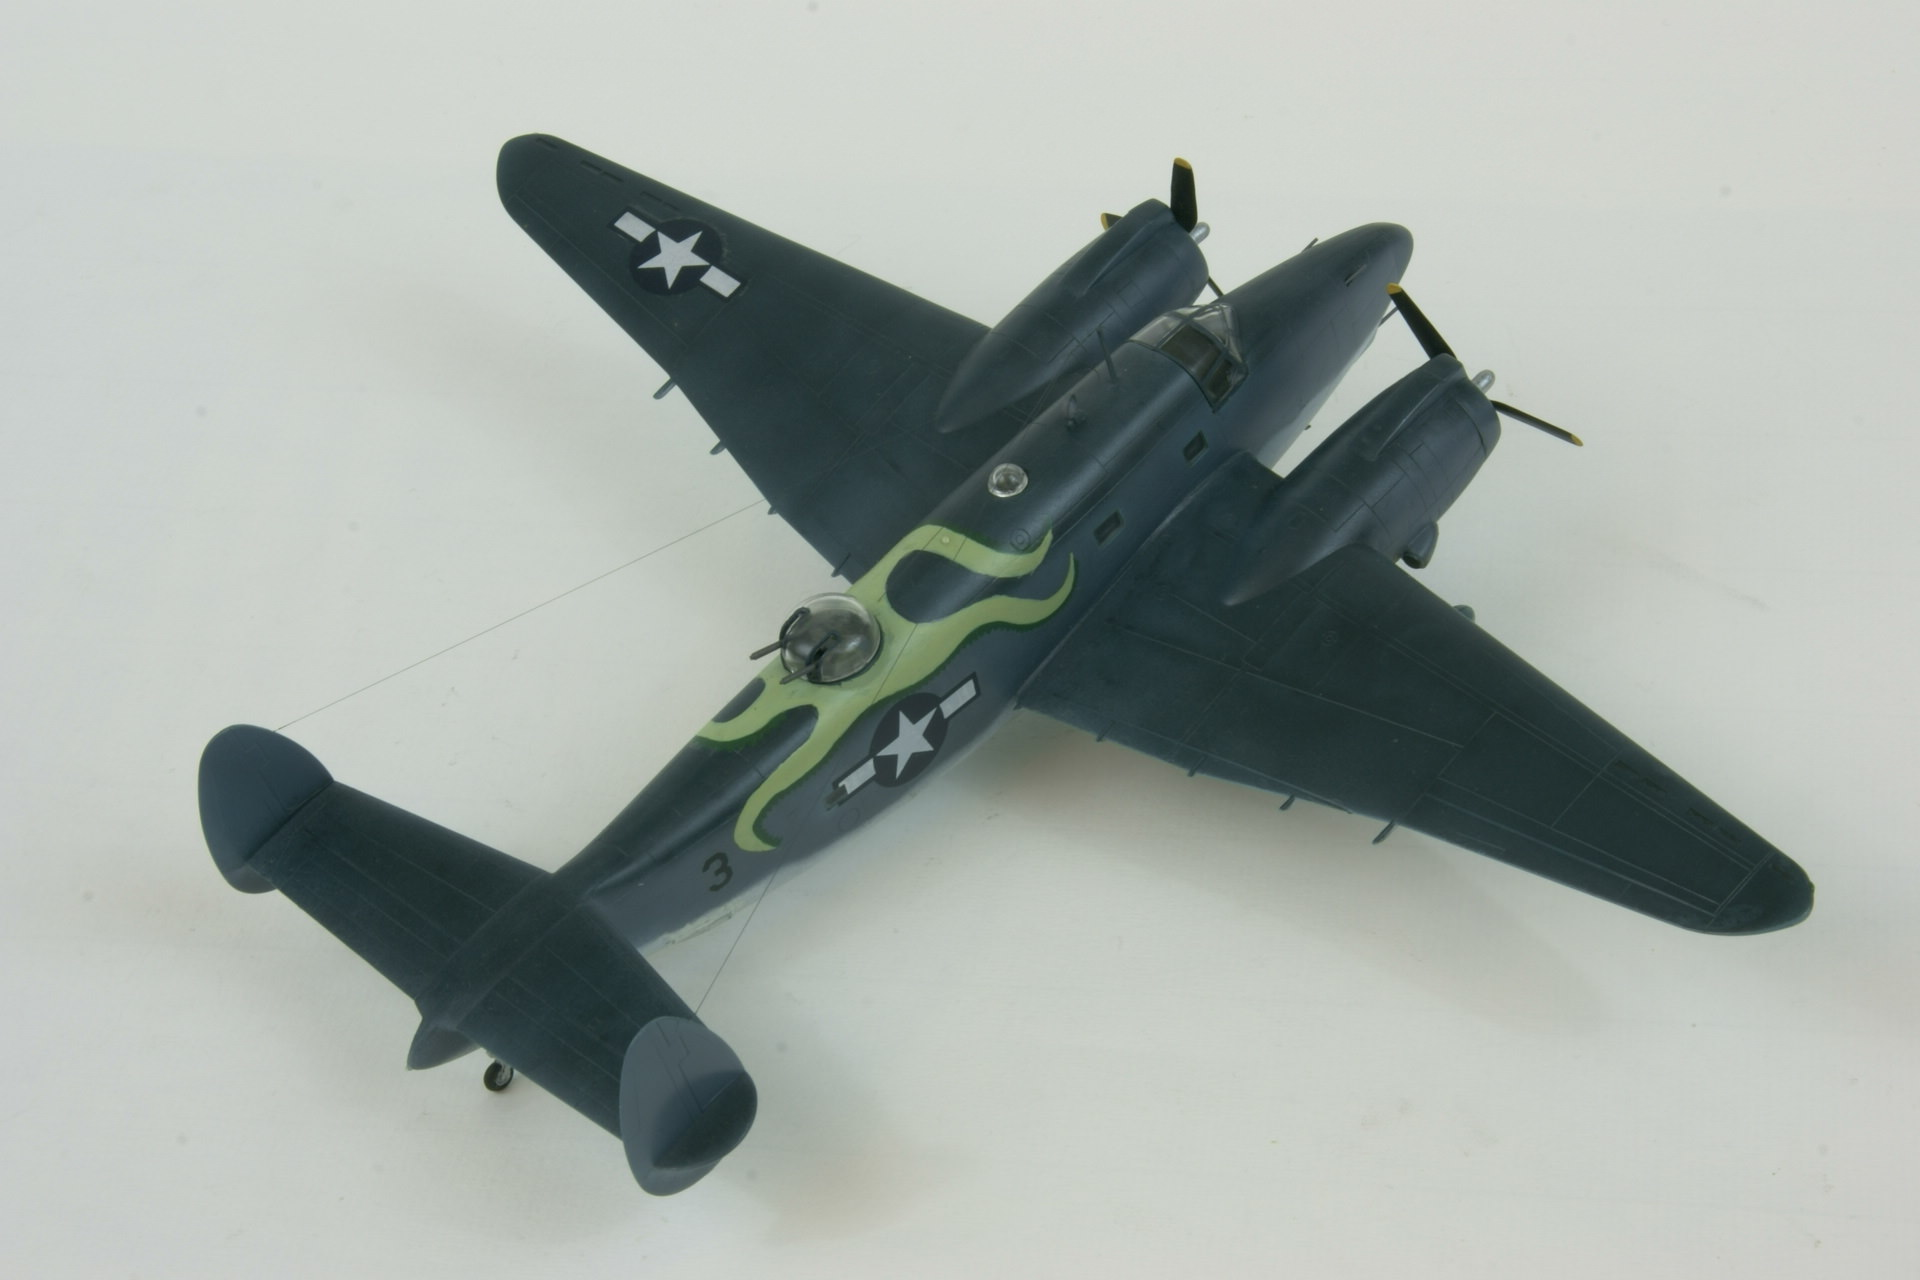 Lockheed pv 1 ventura 8 2